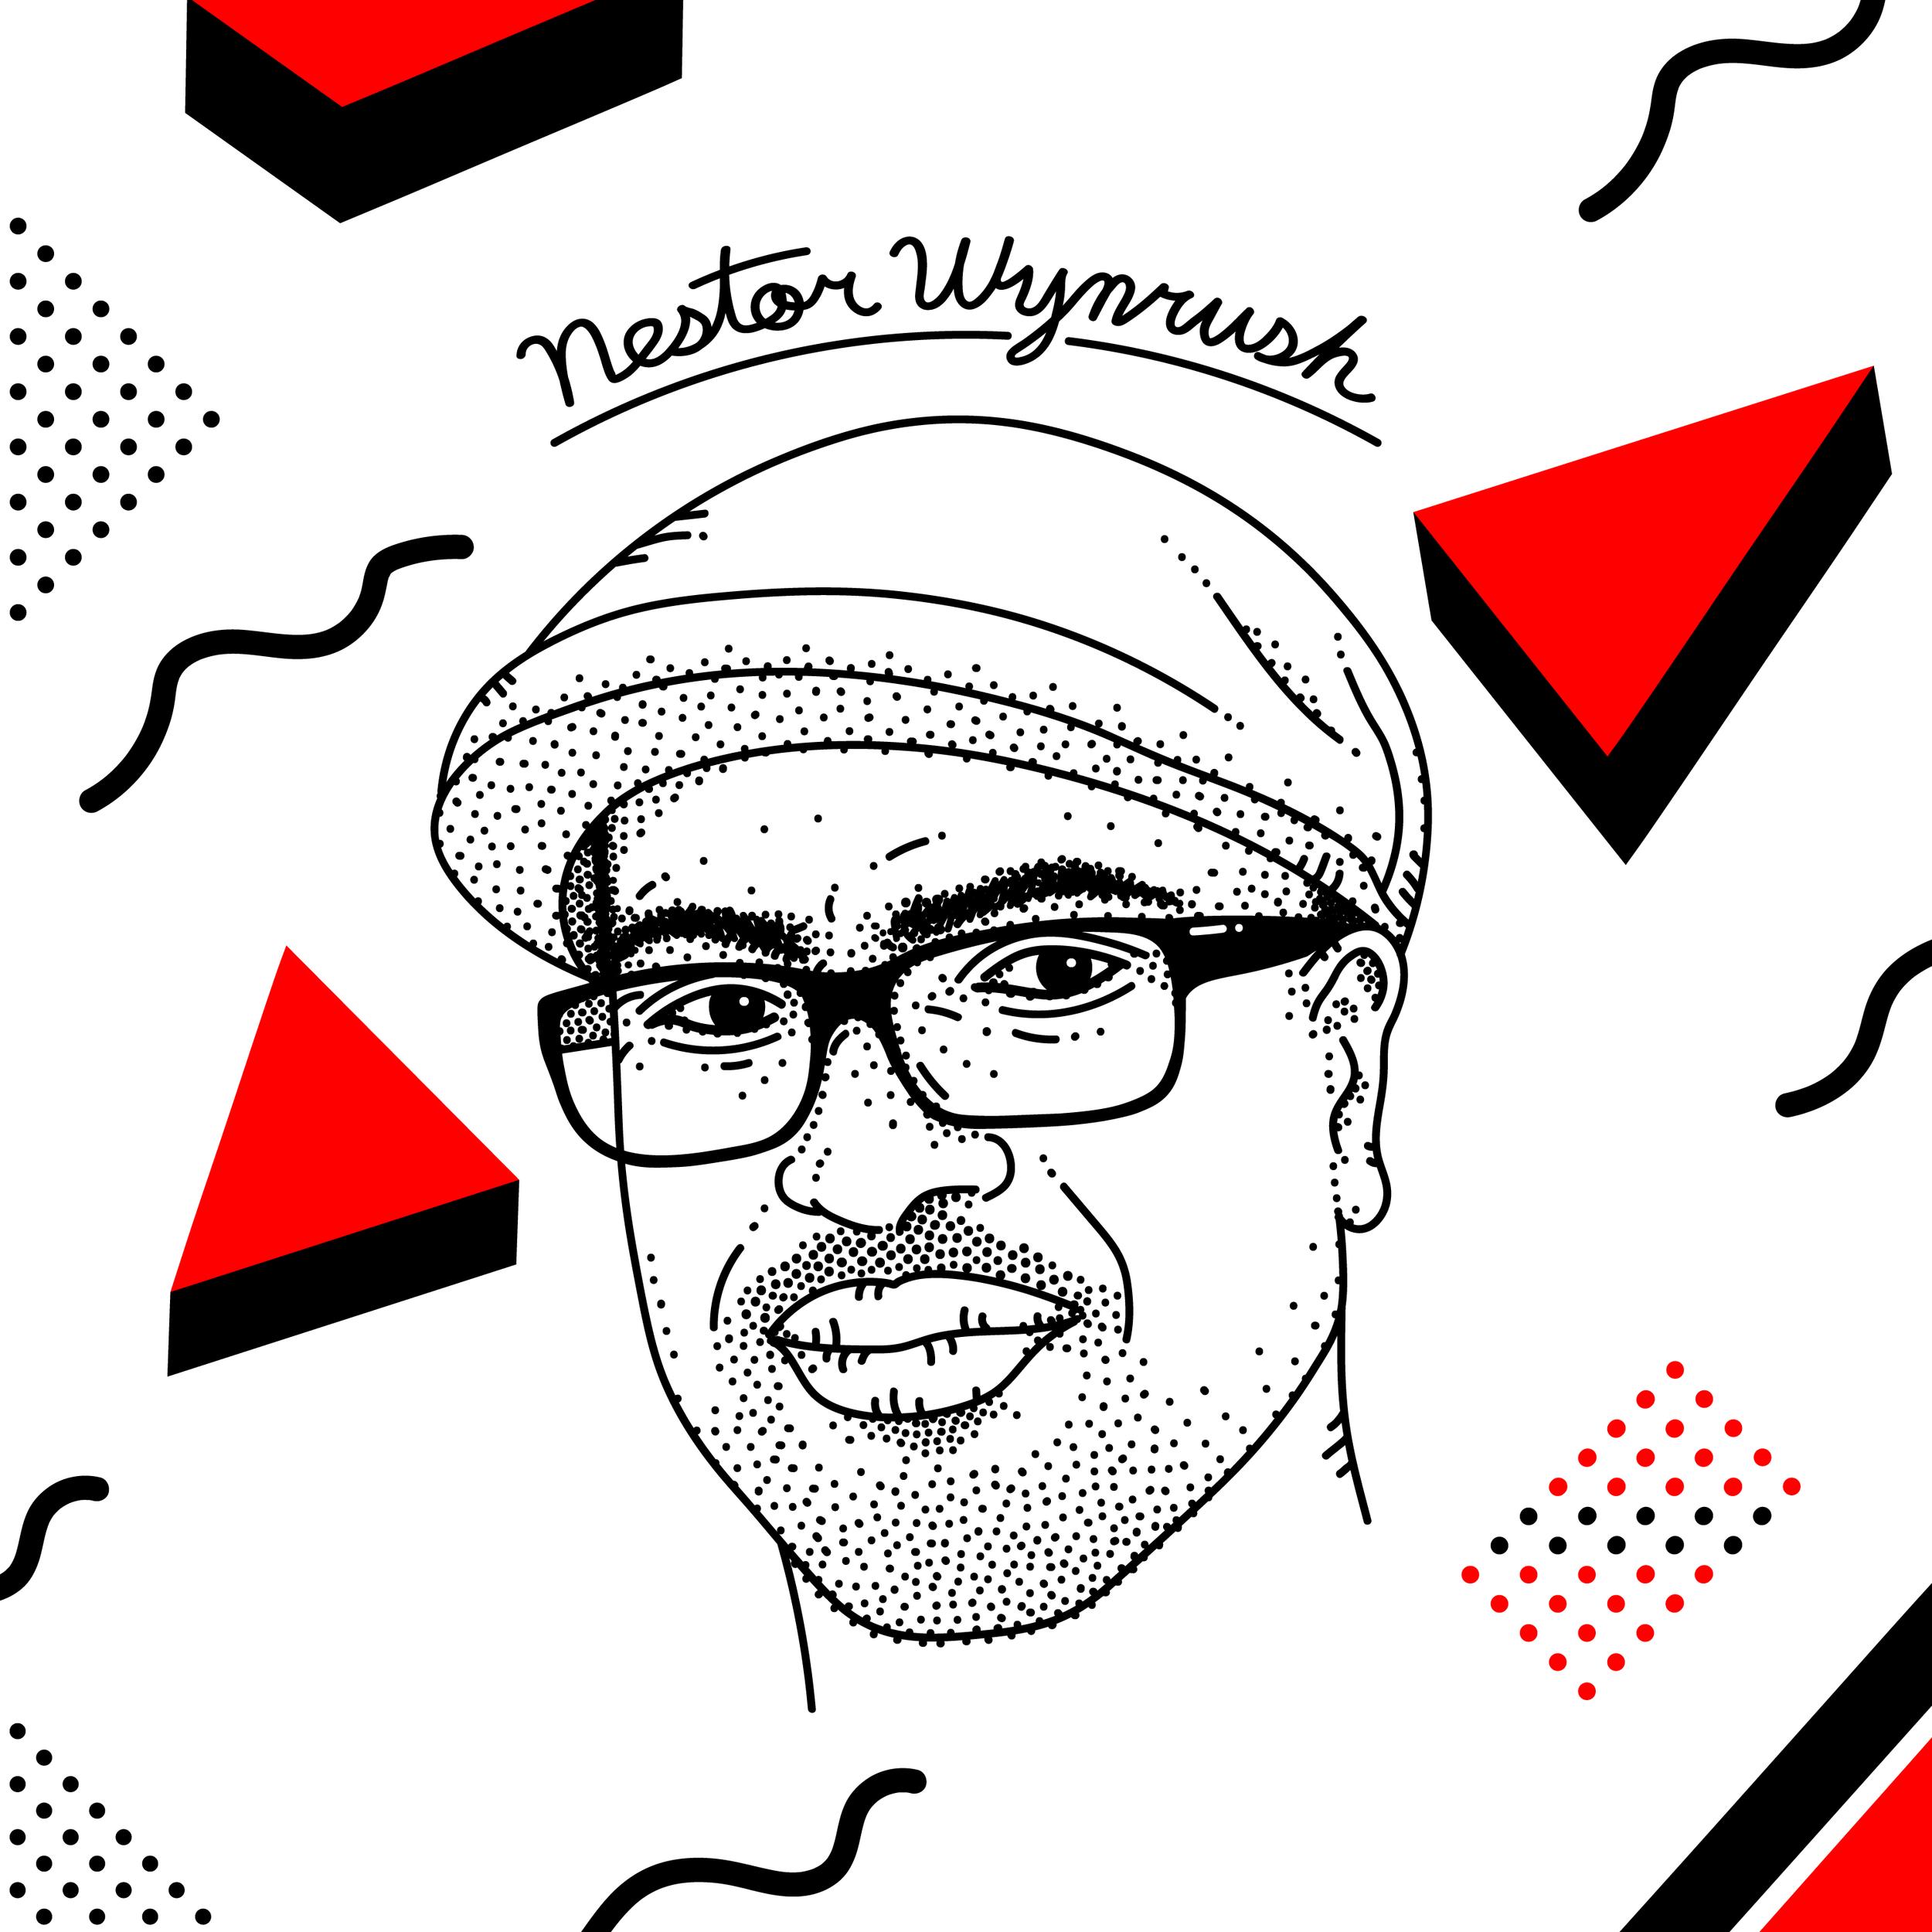 Episode 21 - Nestor Wynrush - Clotheshorse Records